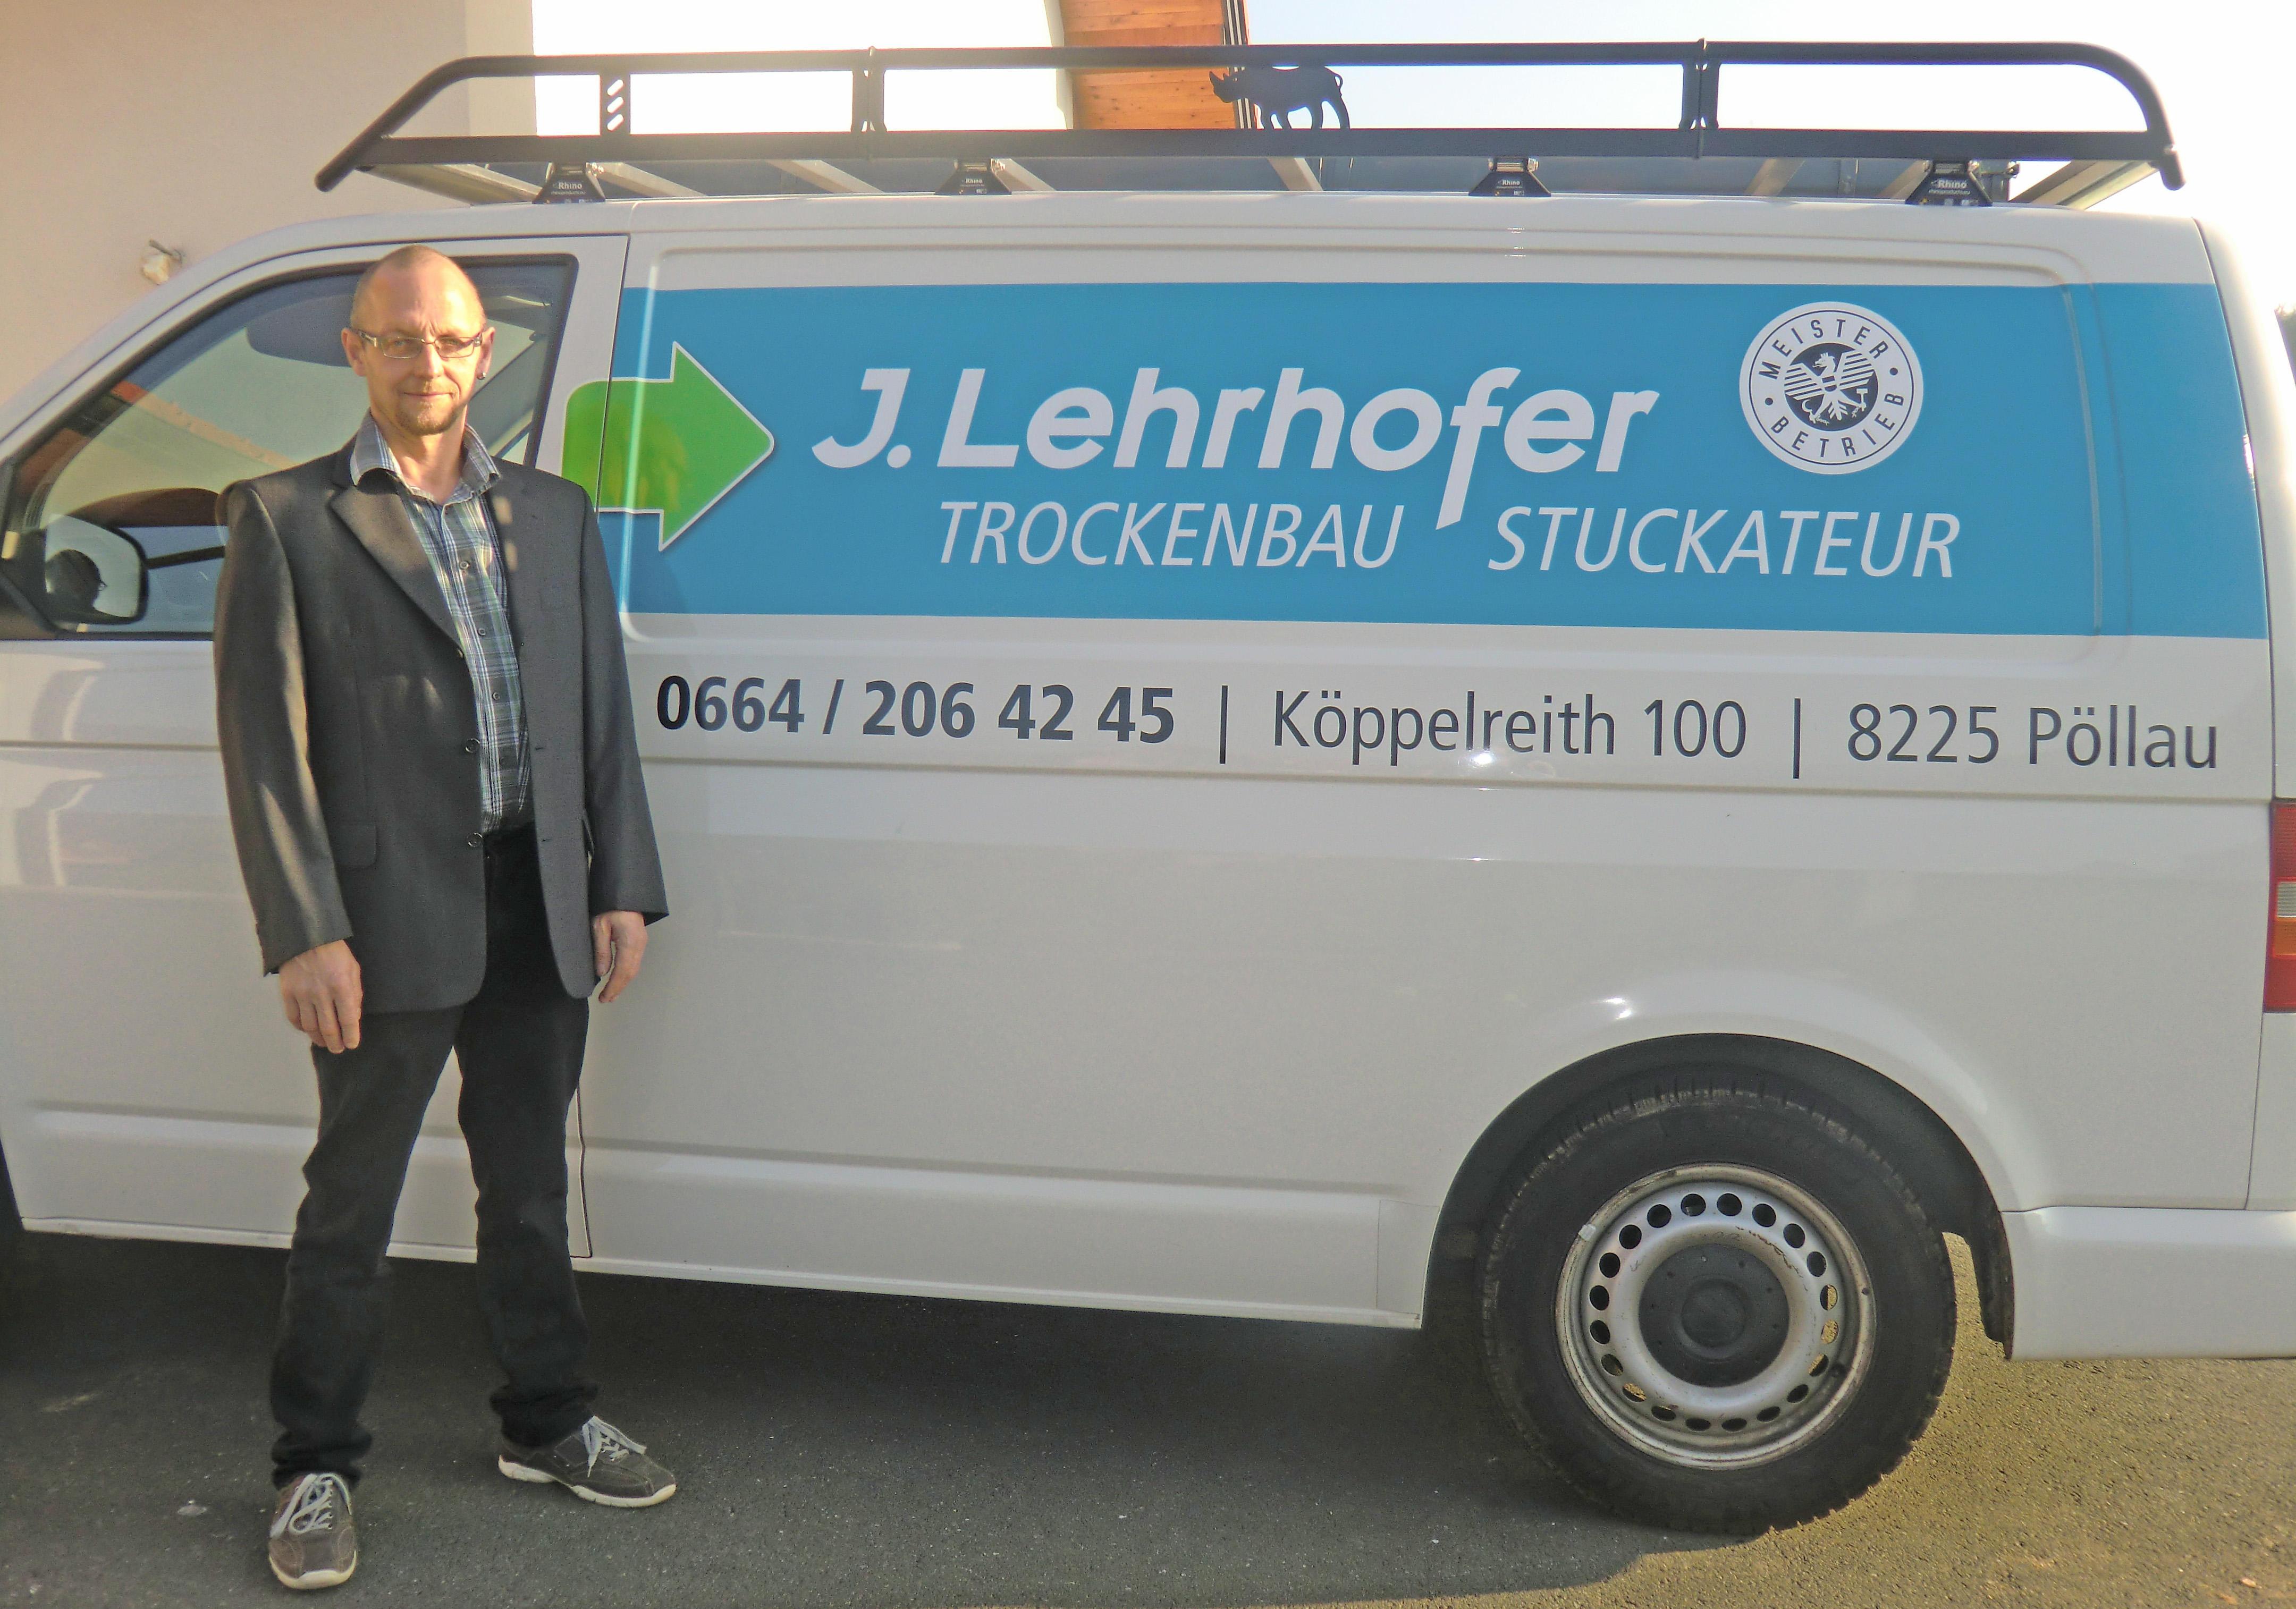 Josef Lehrhofer